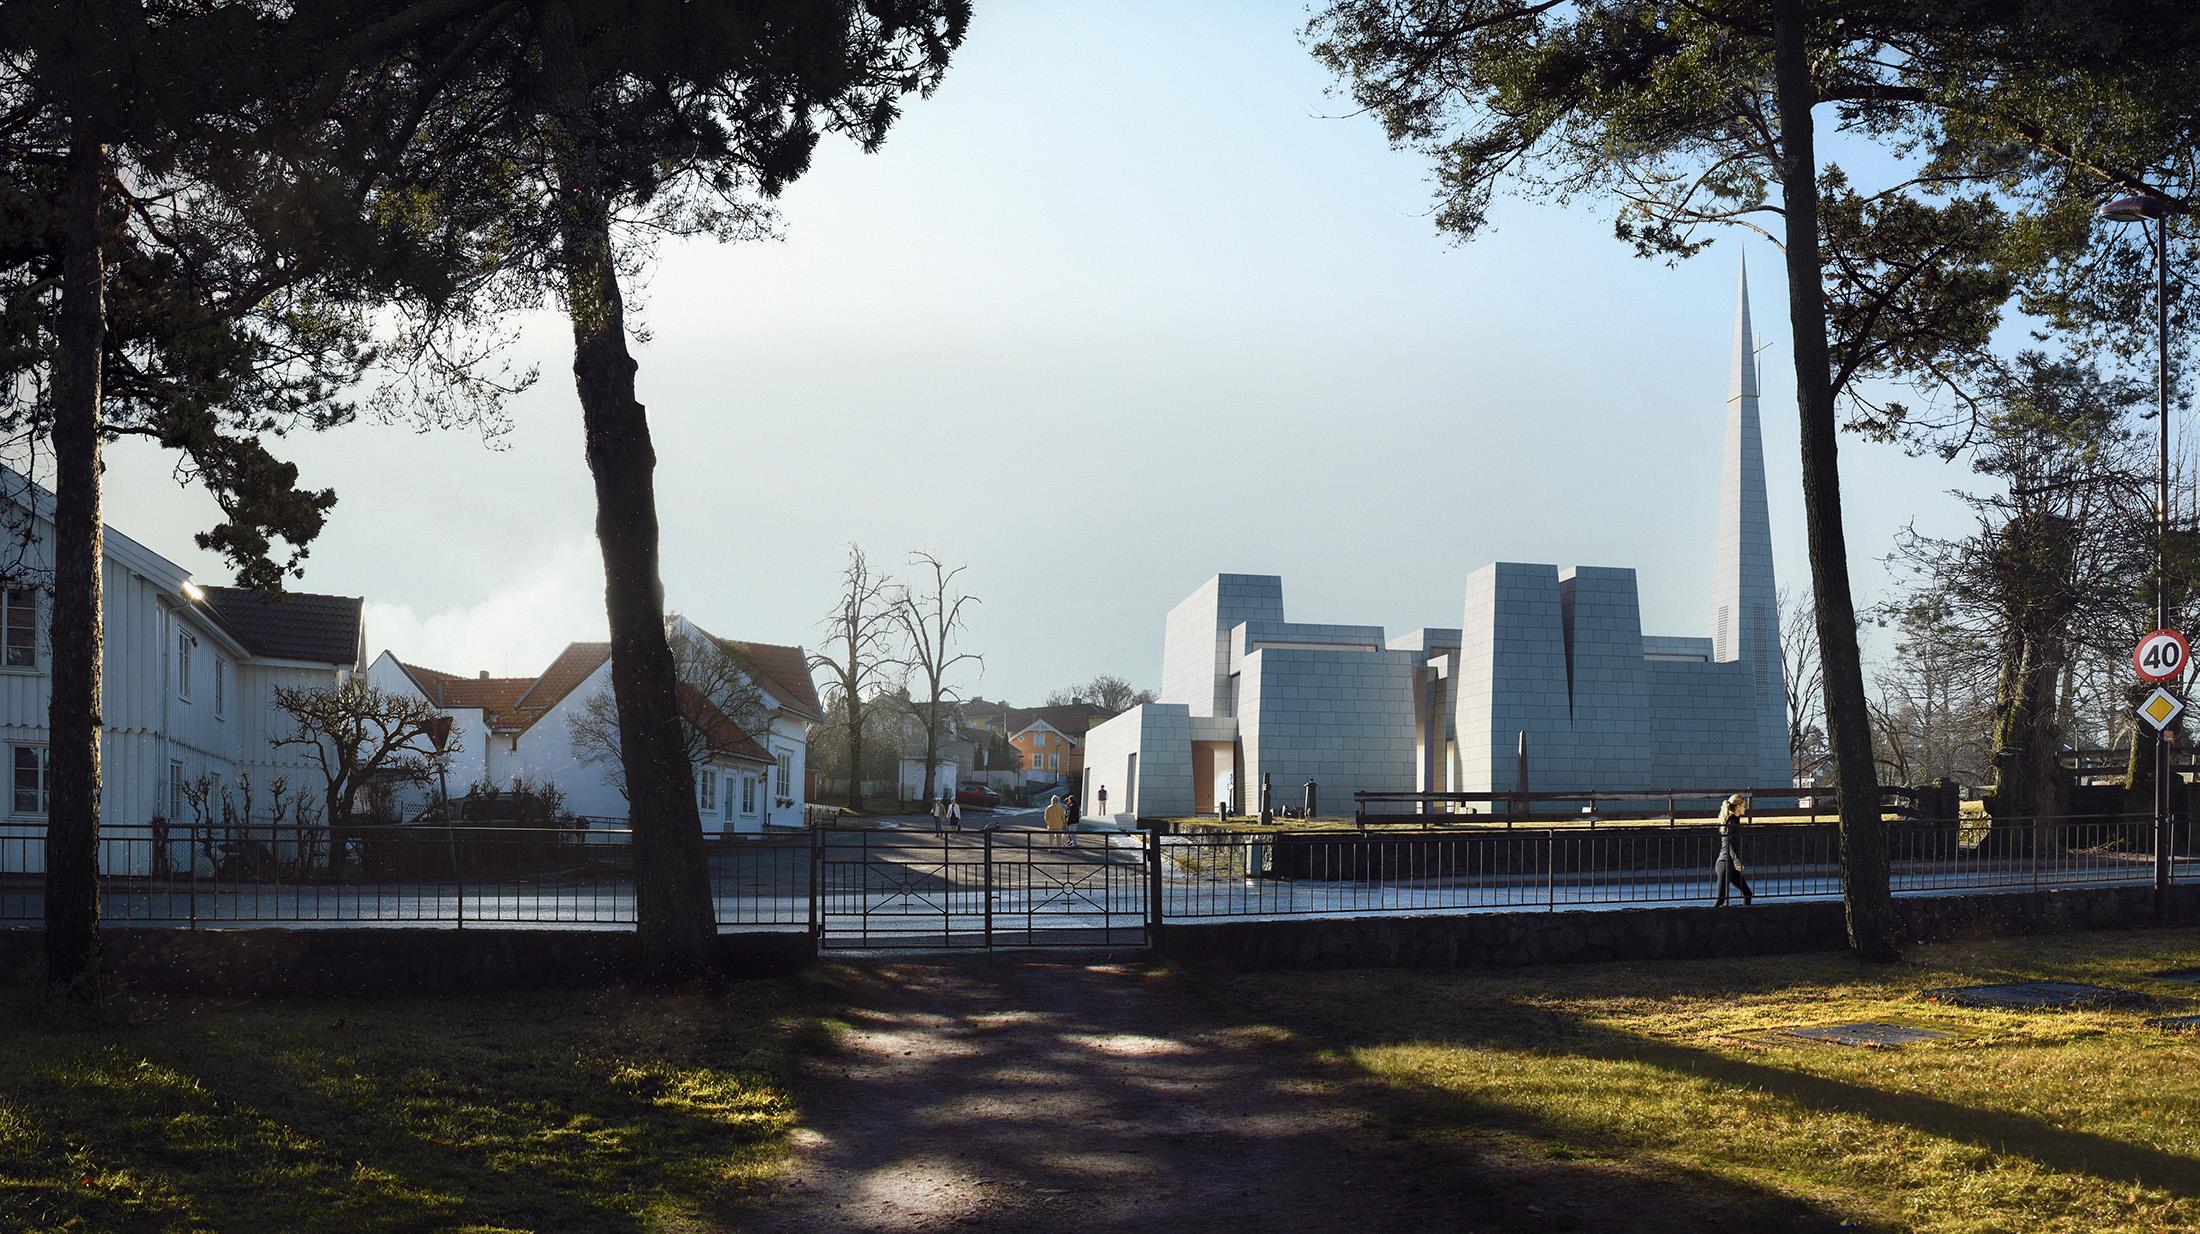 Troark, Surnevik, Porsgrunn Church, Norway, 2017